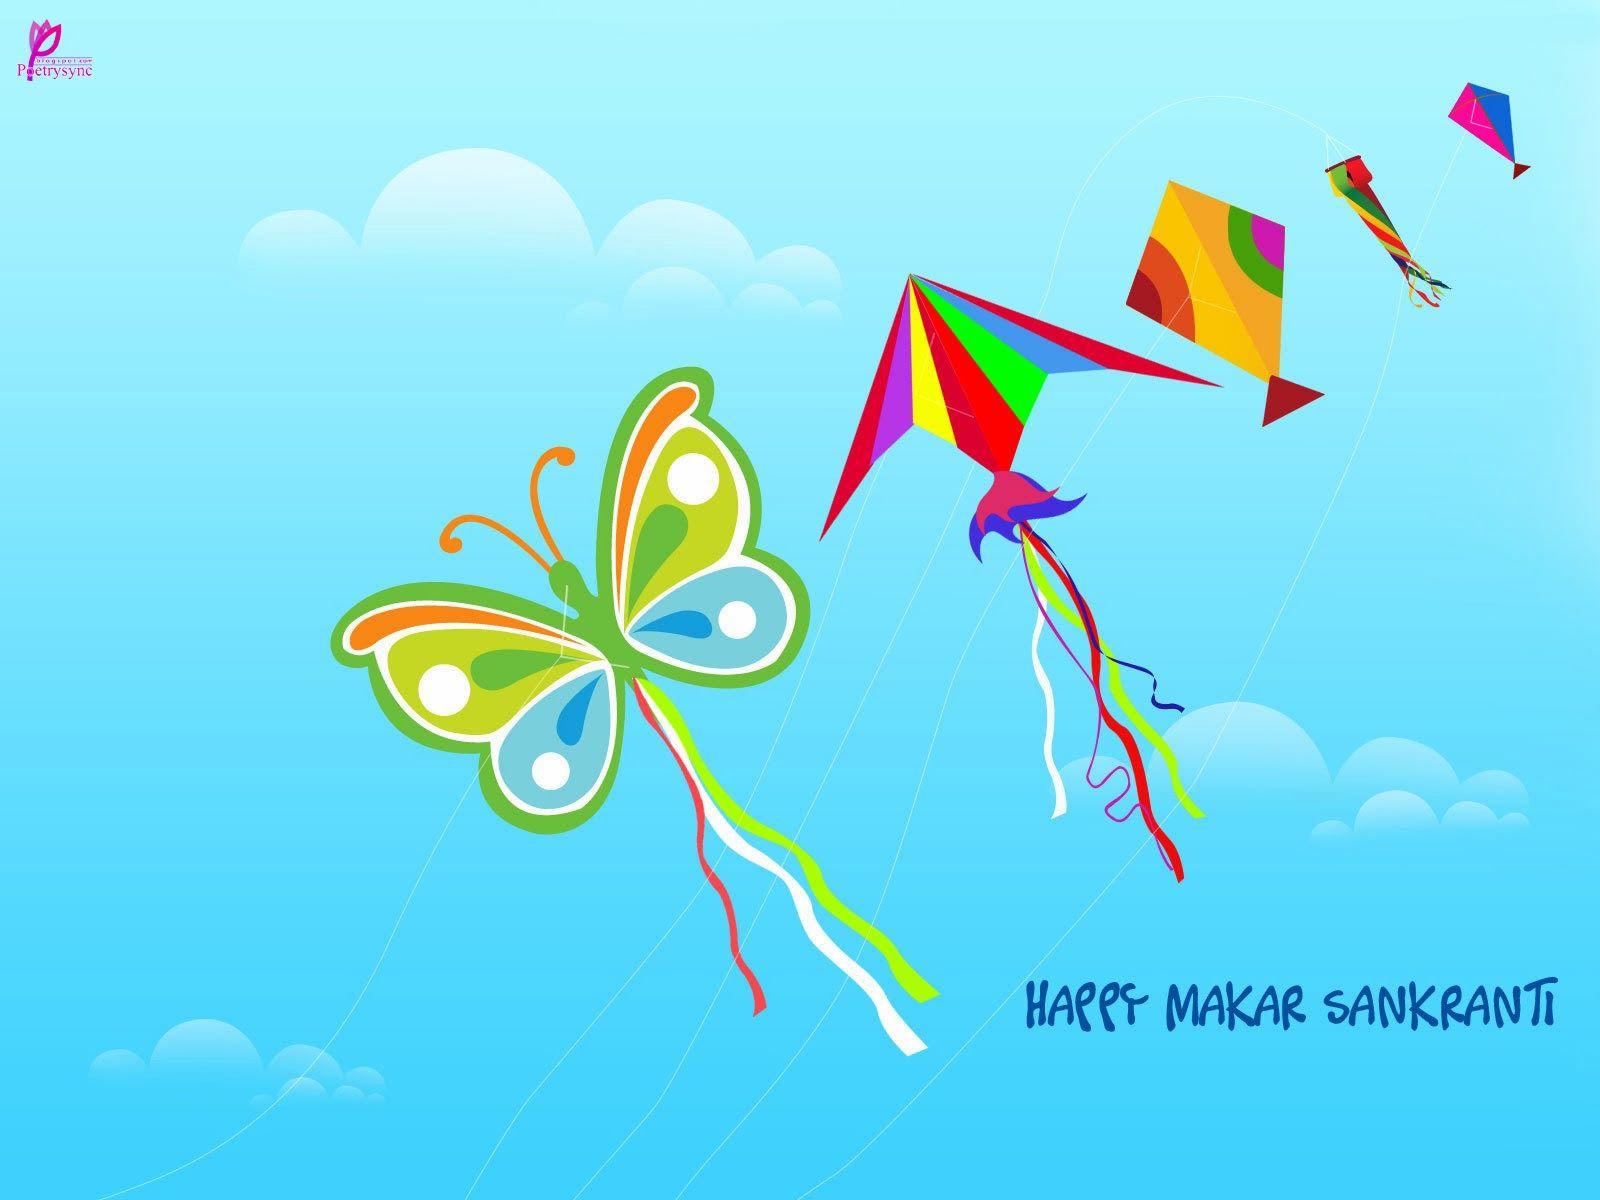 Happy Makar Sankranti Kites Wishes Card Image Wallpaper Makar